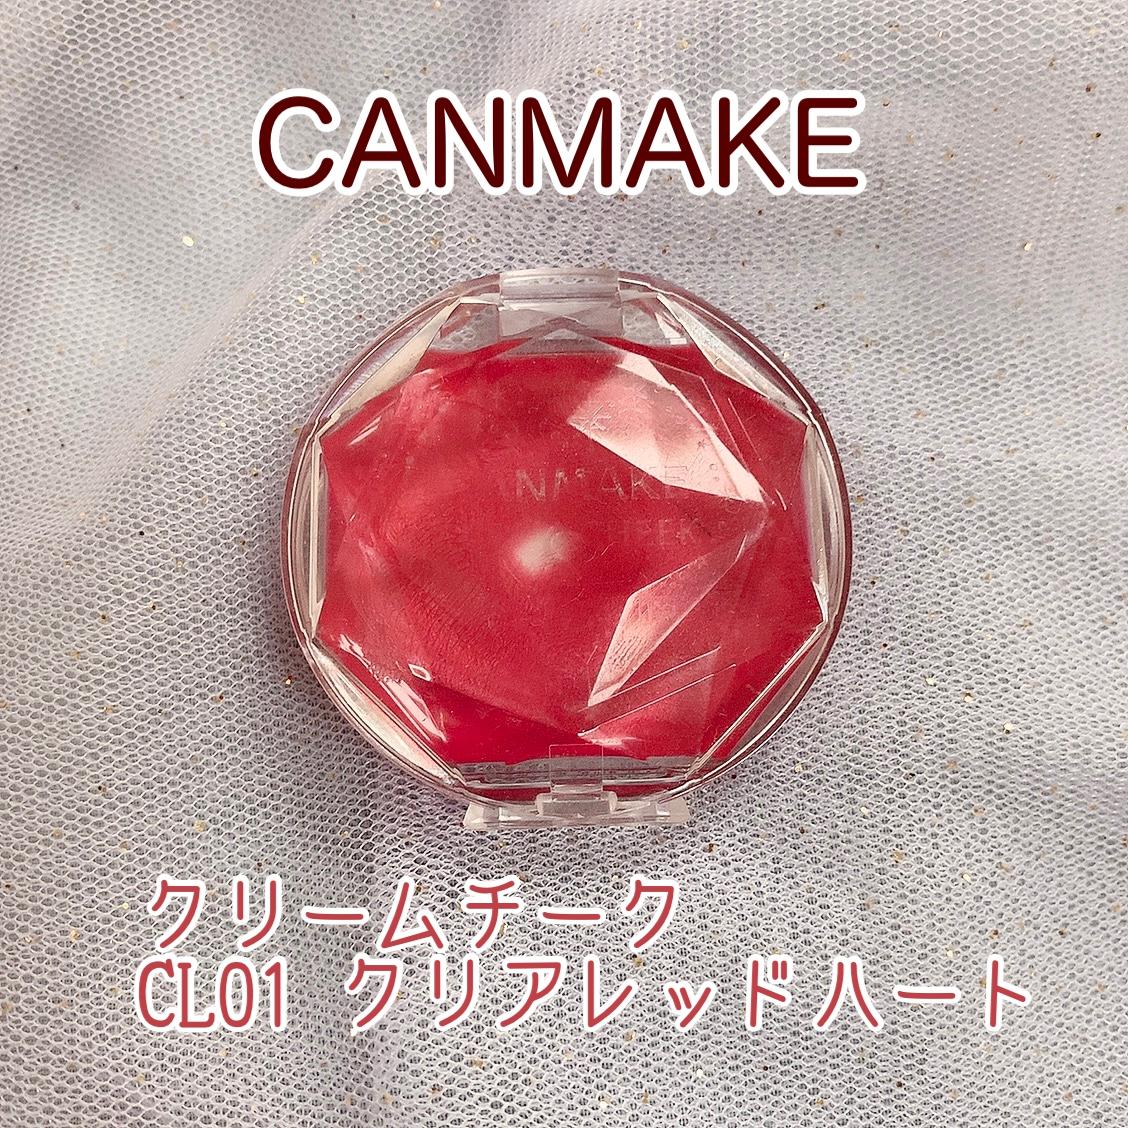 CANMAKE(キャンメイク) クリームチークを使ったあやかさんのクチコミ画像